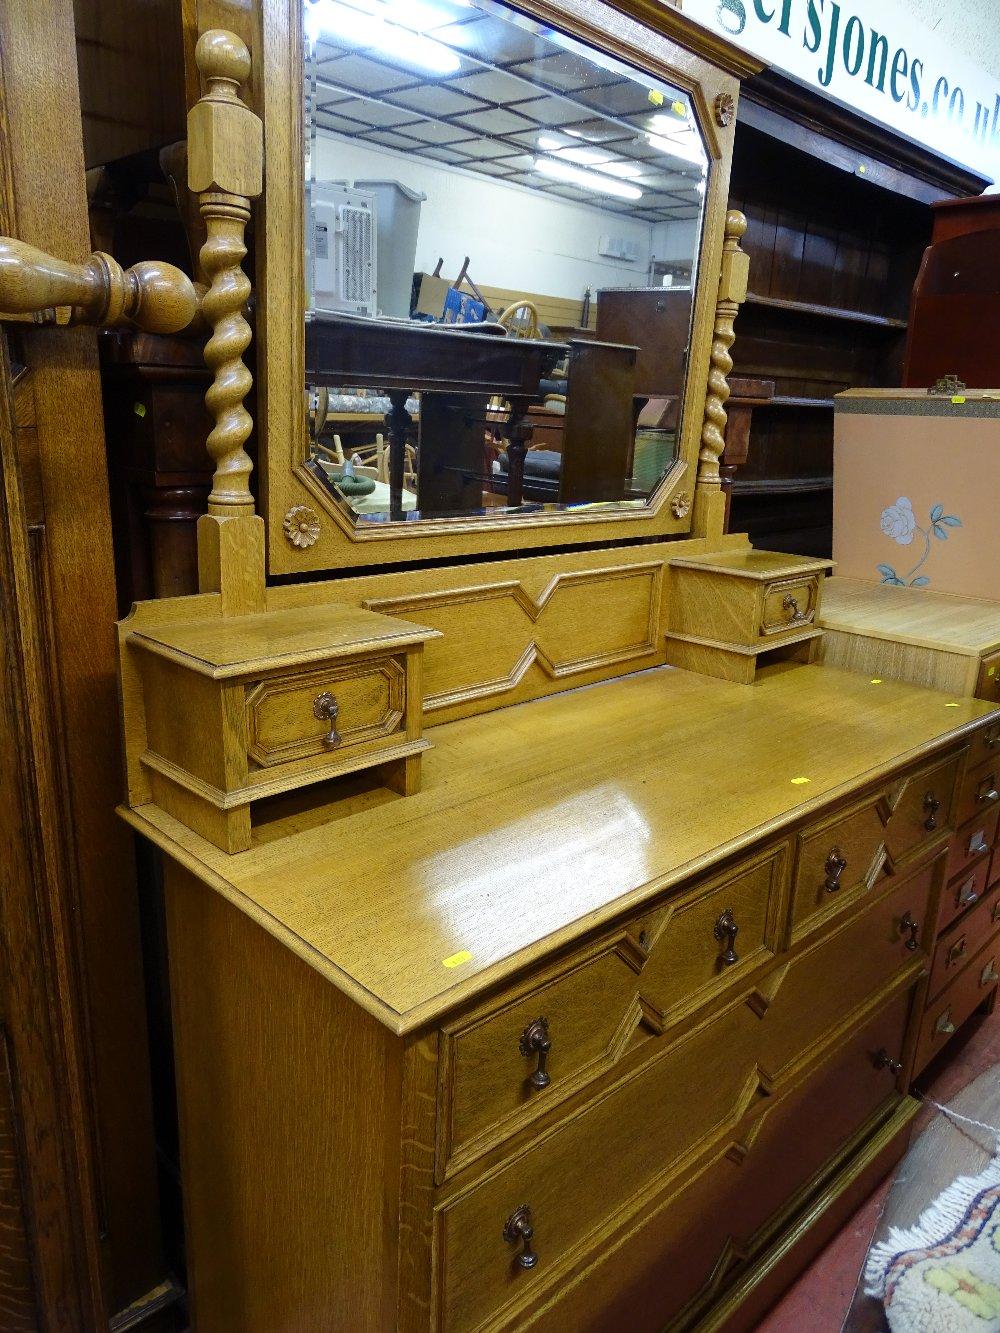 Lot 13 - Good quality light oak mirrored dressing chest